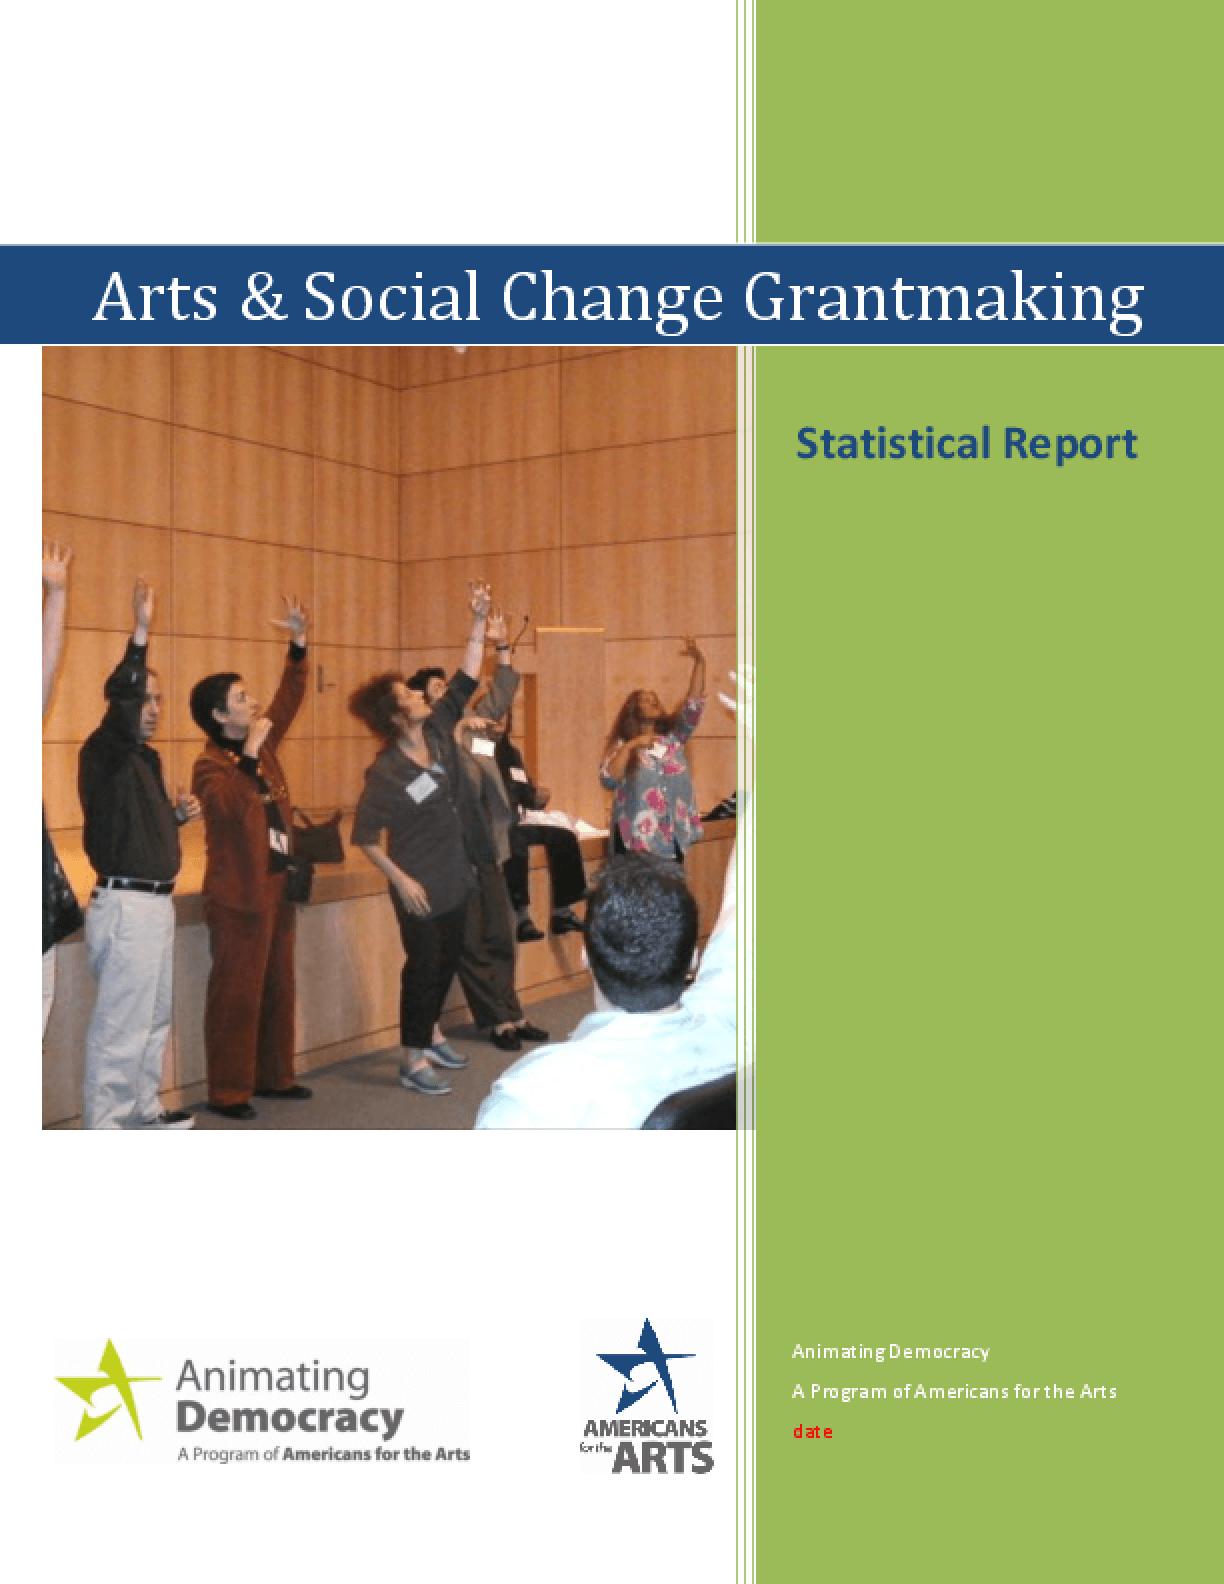 Arts & Social Change Grantmaking: Statistical Report